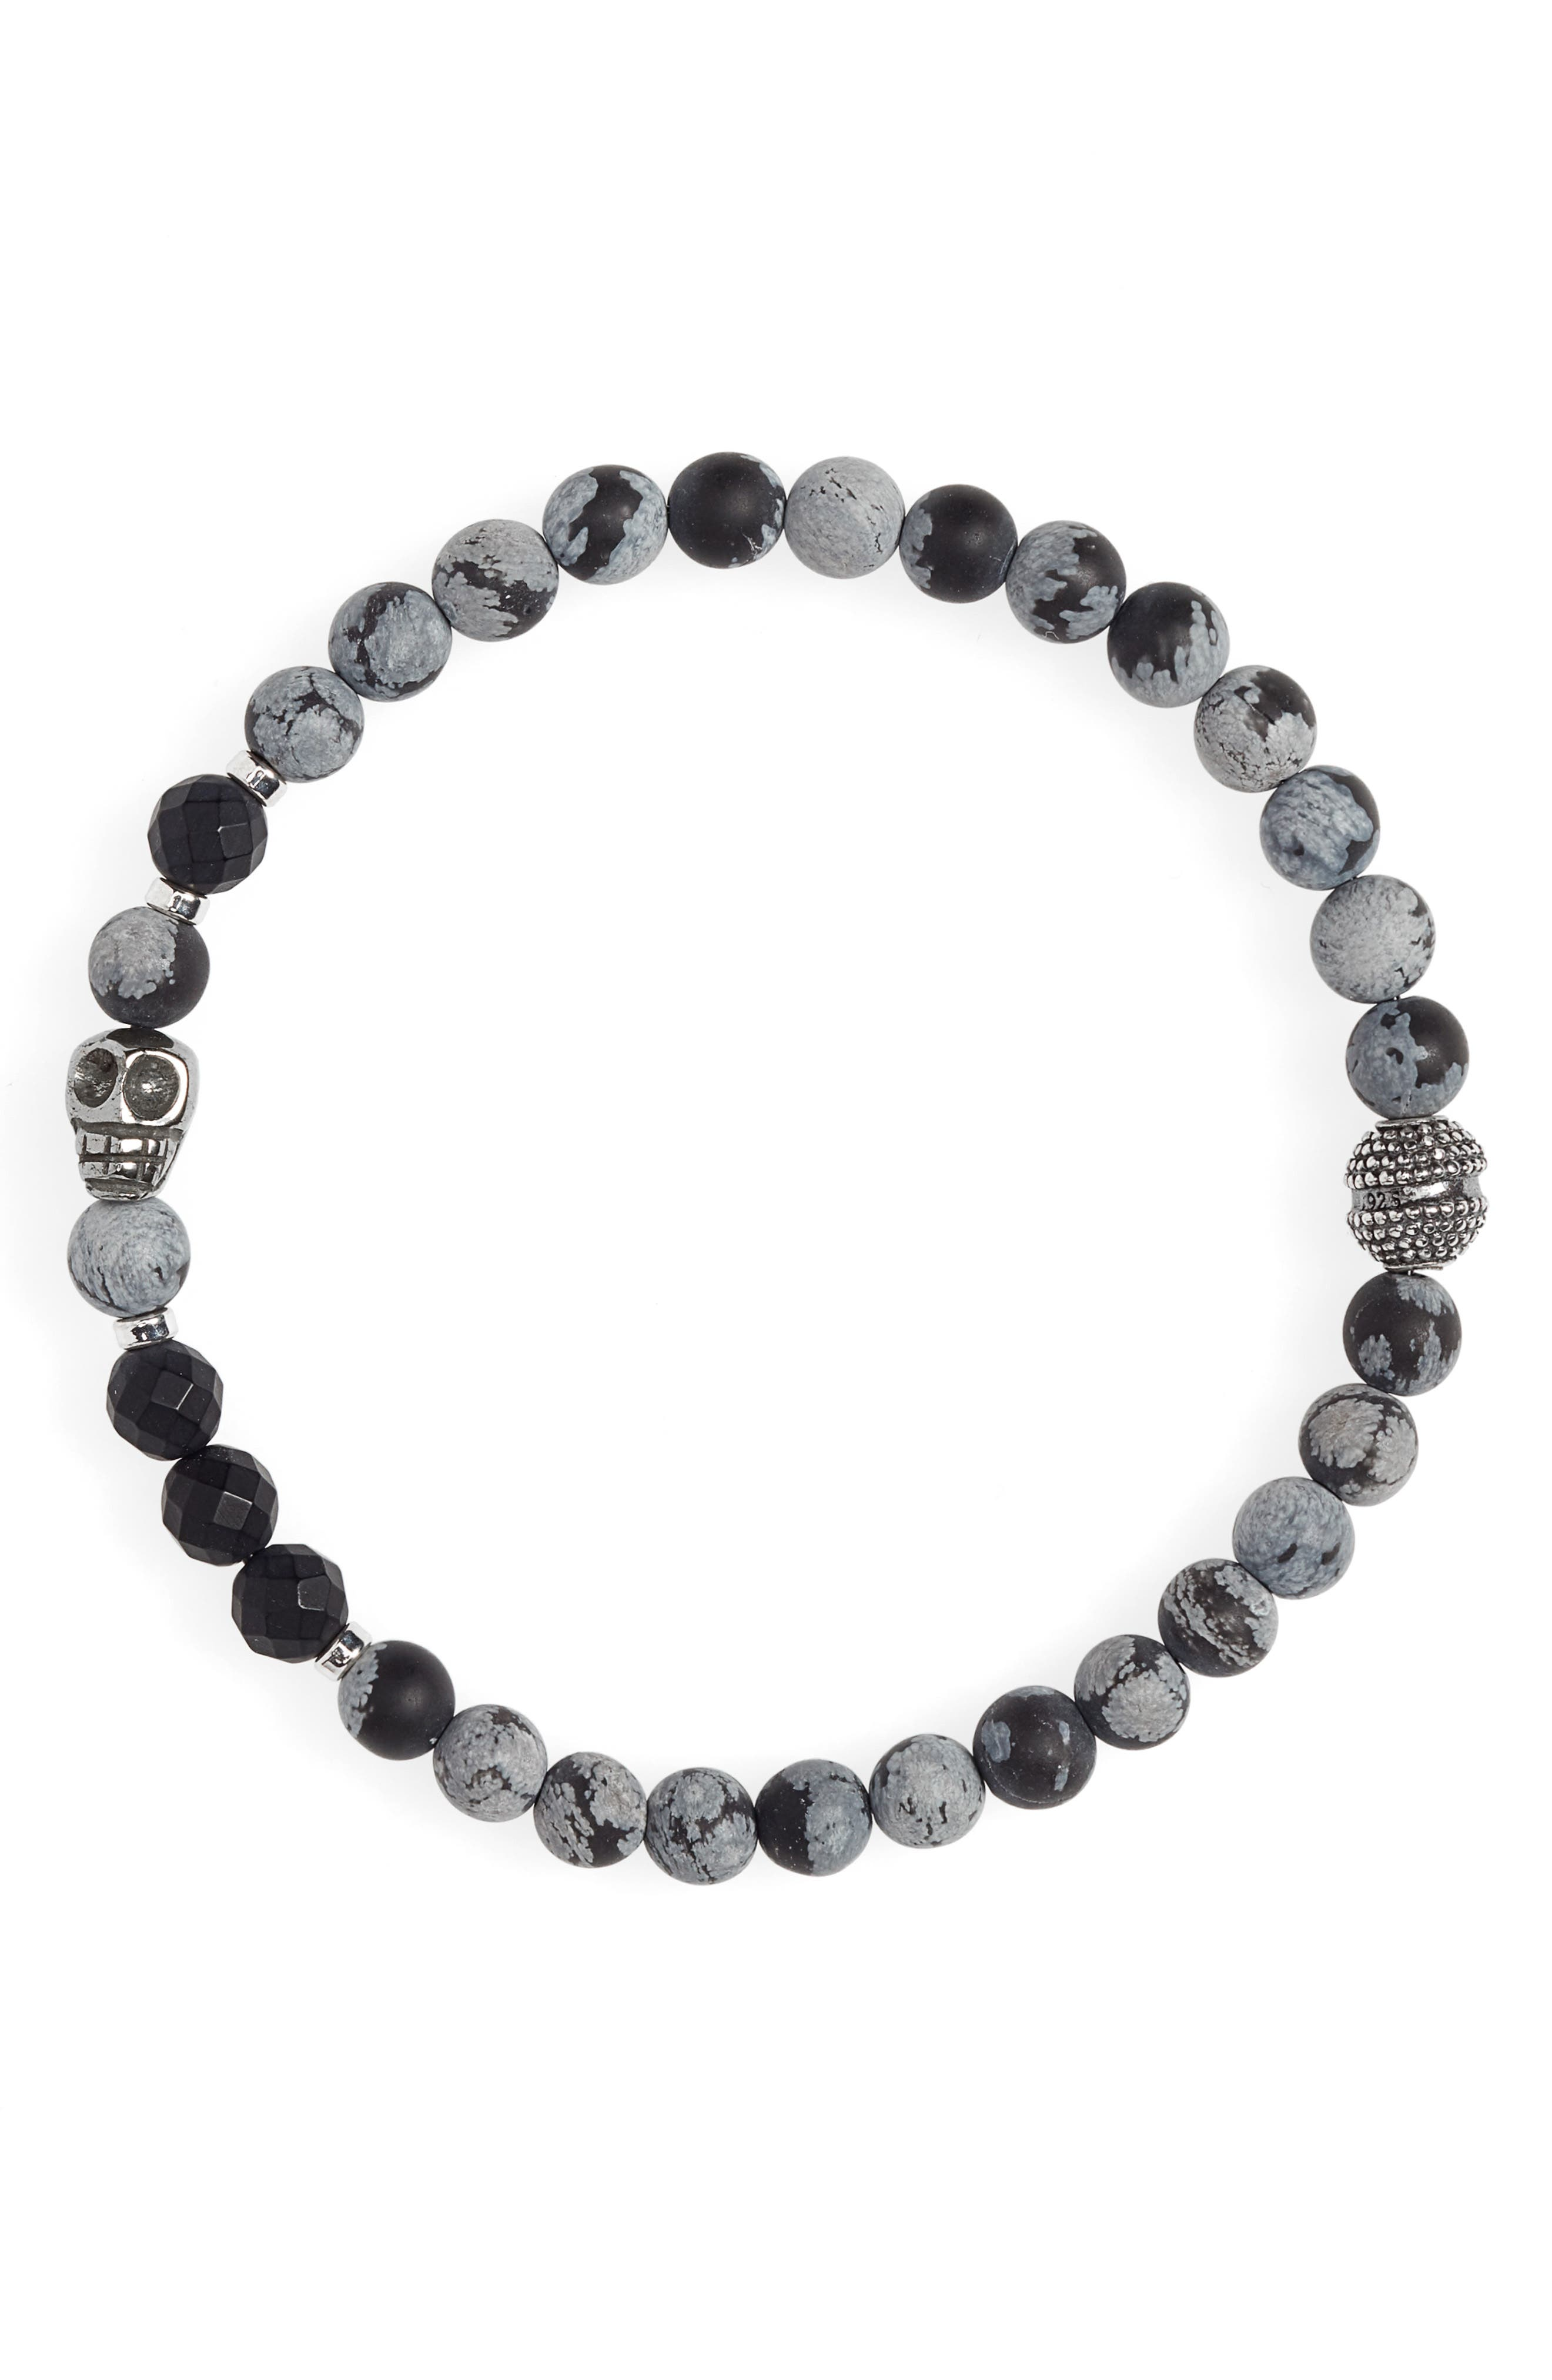 JONAS STUDIO Stone Bead Bracelet in Grey